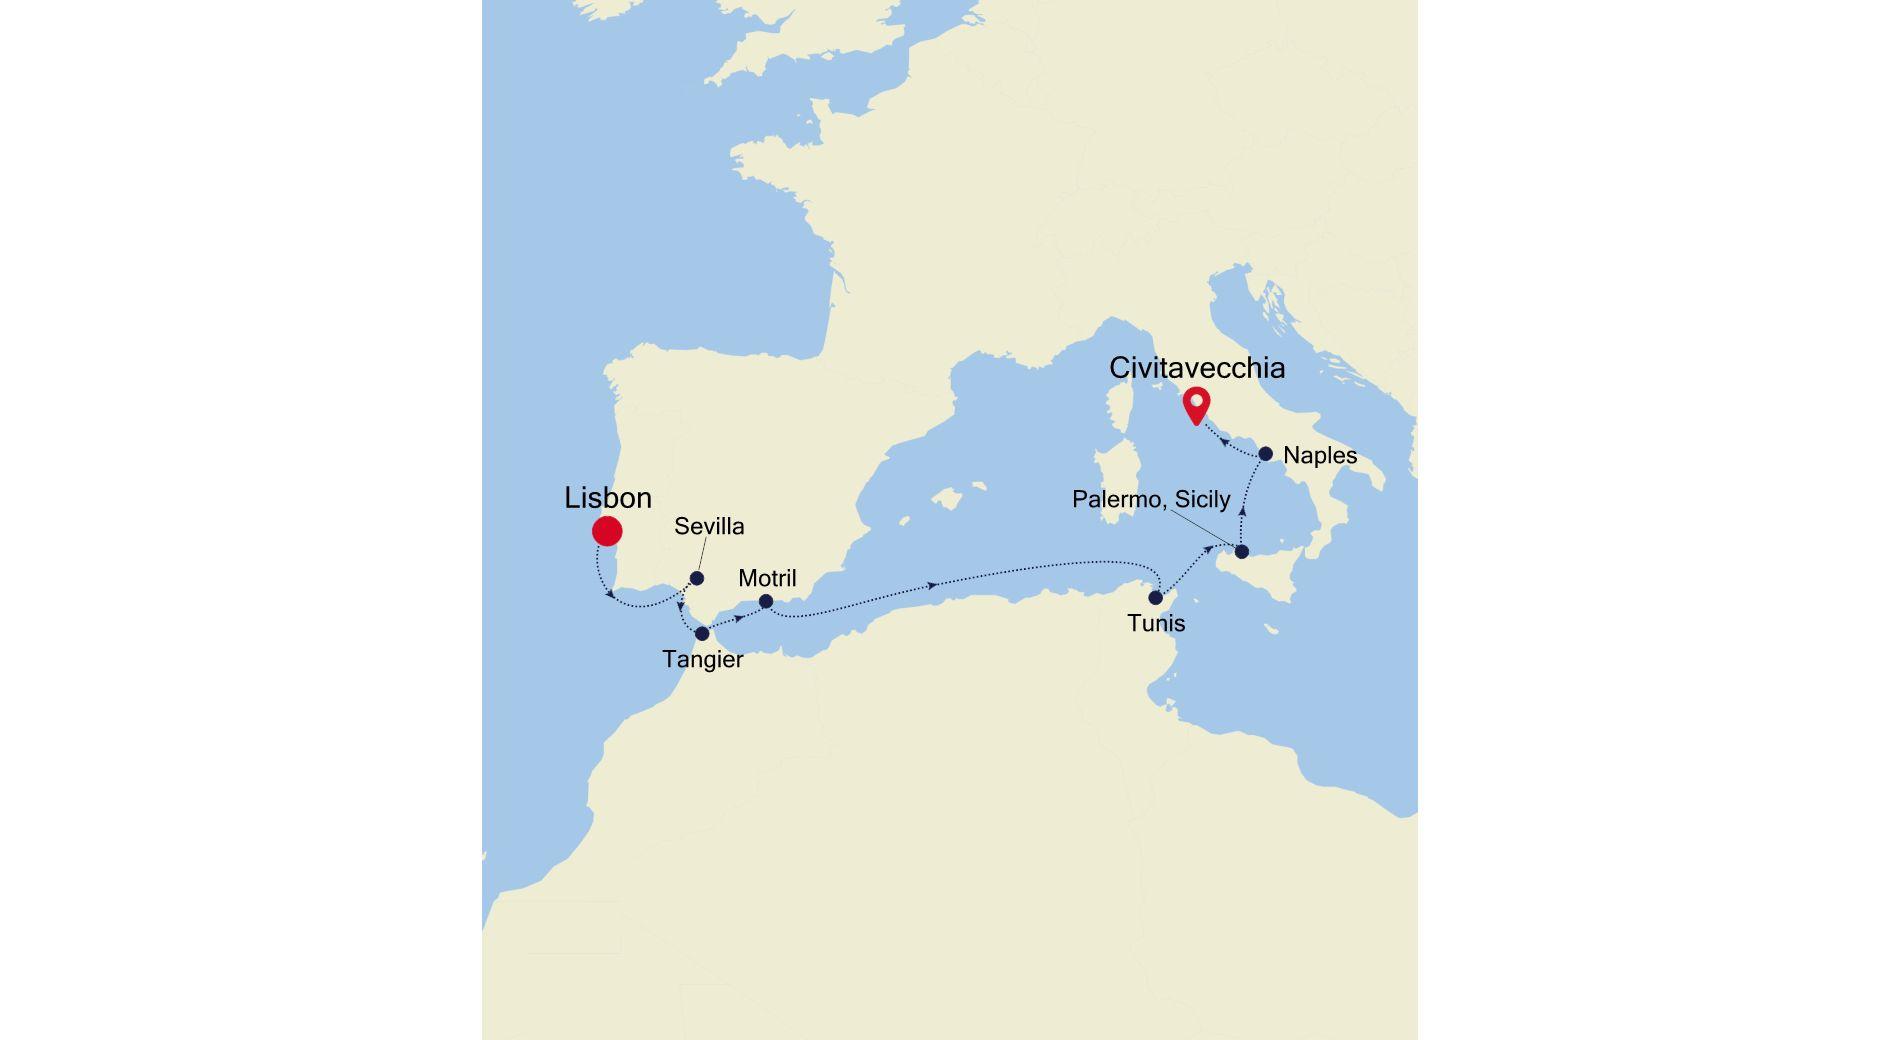 SS211105010 - Lisbon to Civitavecchia